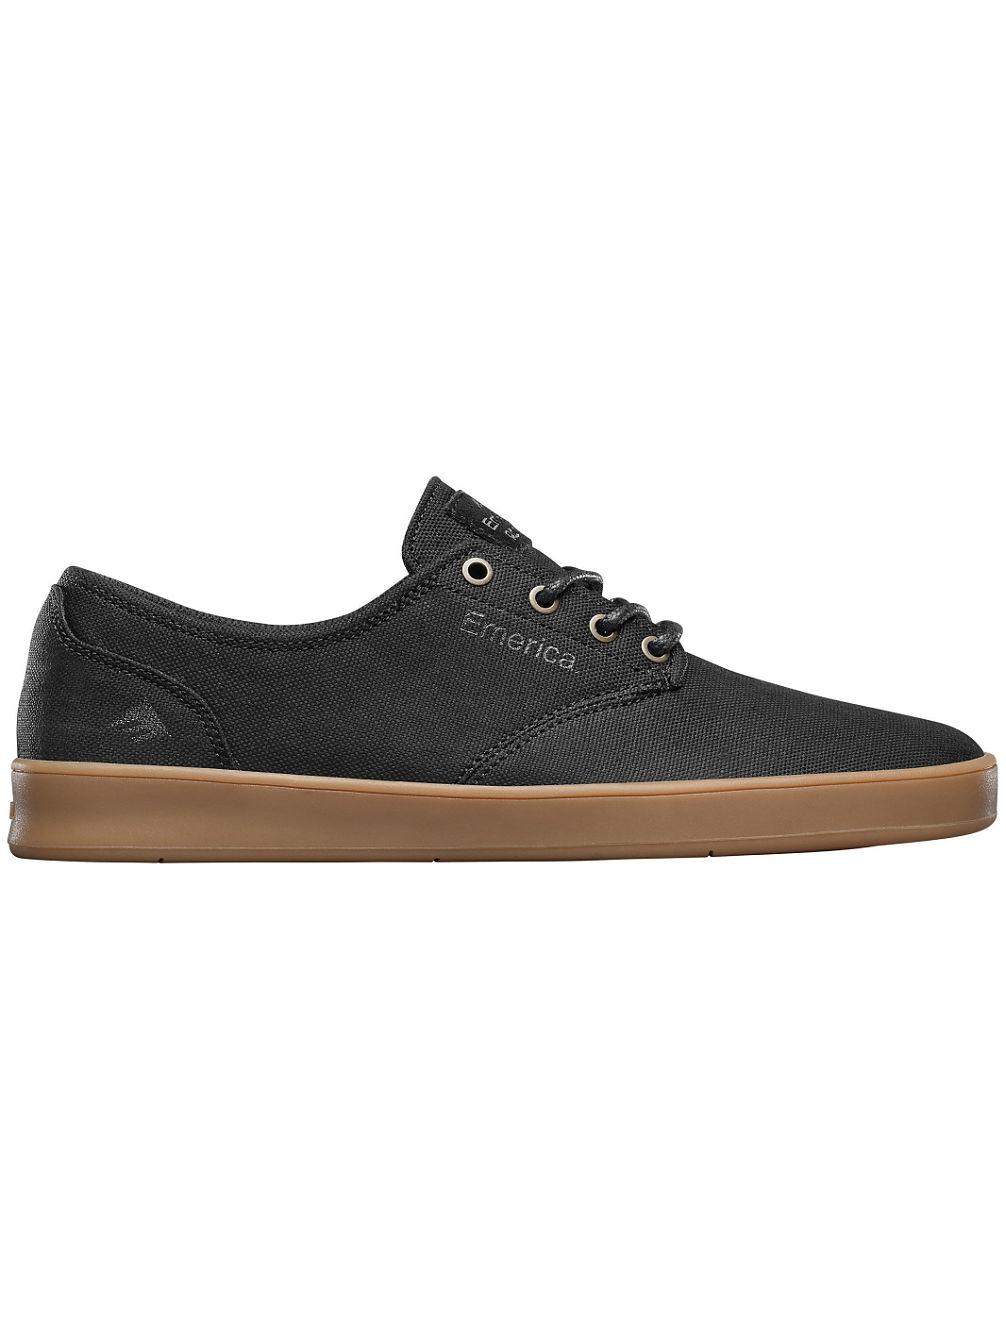 Emerica Shoes Romero Laced